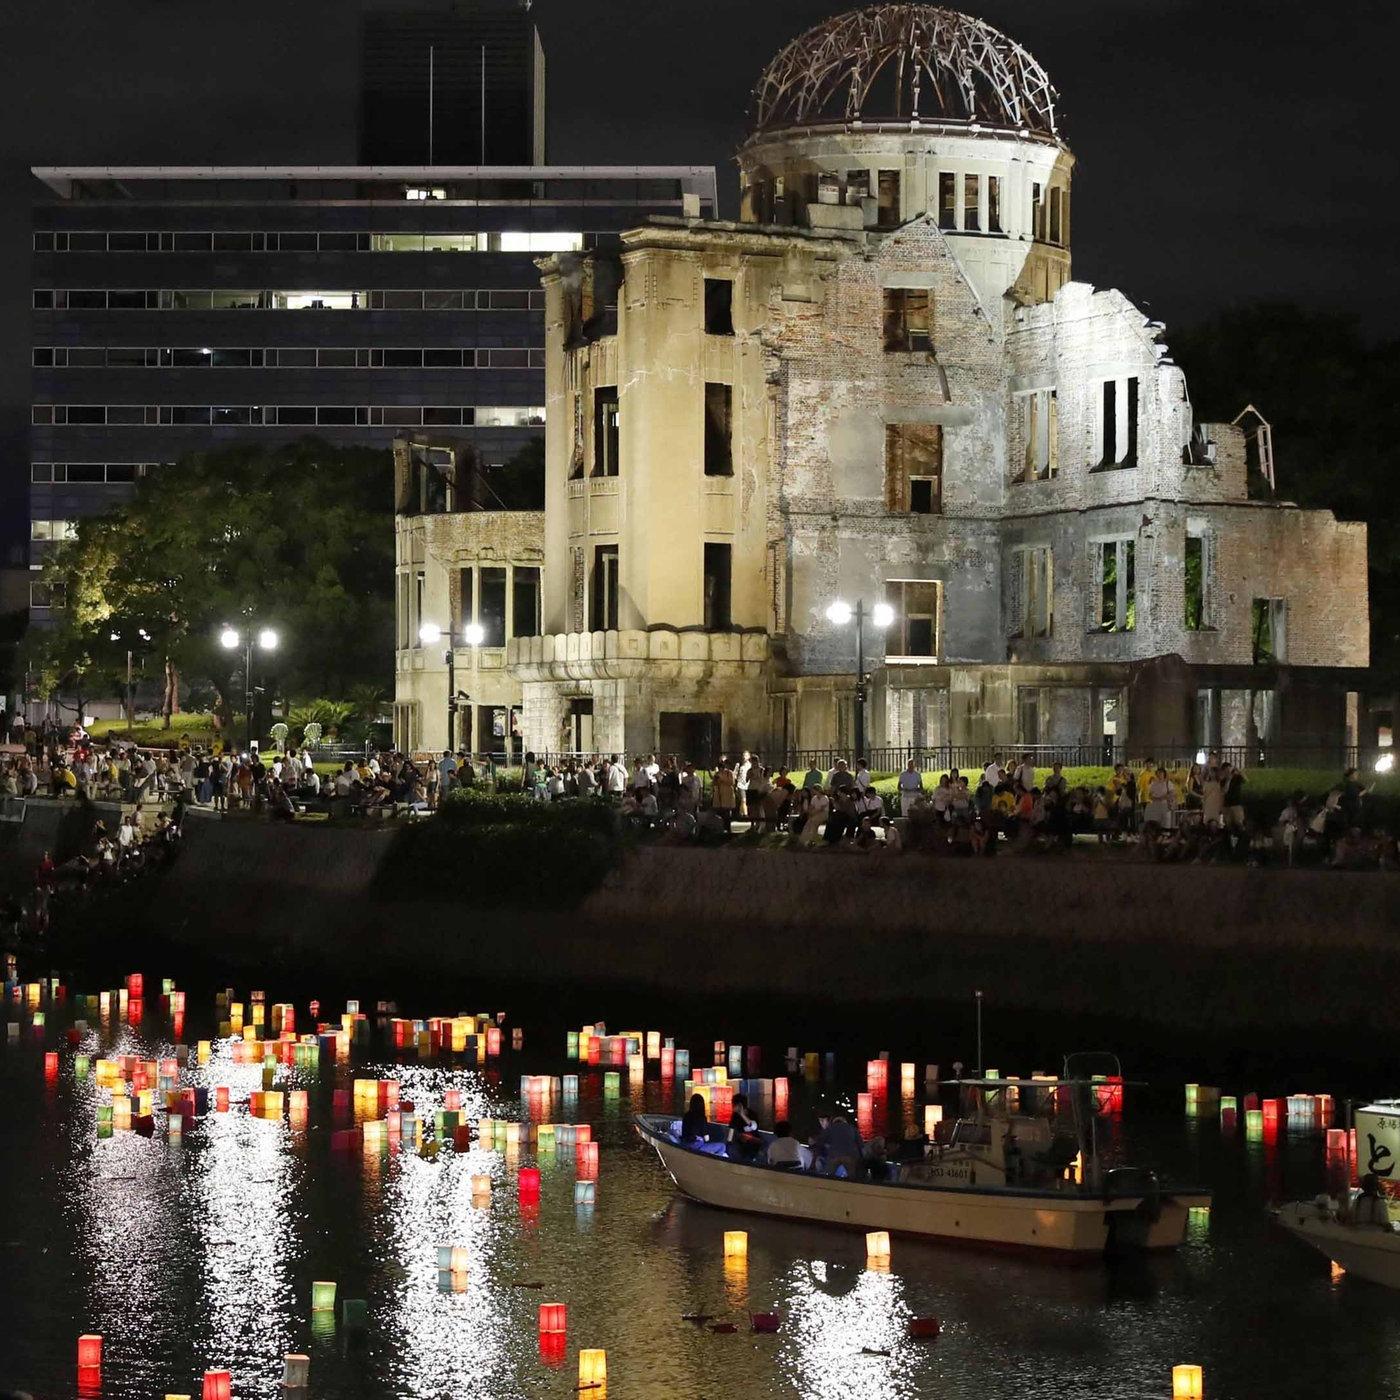 Abwurf der Atombombe auf Hiroshima (am 06.08.1945)